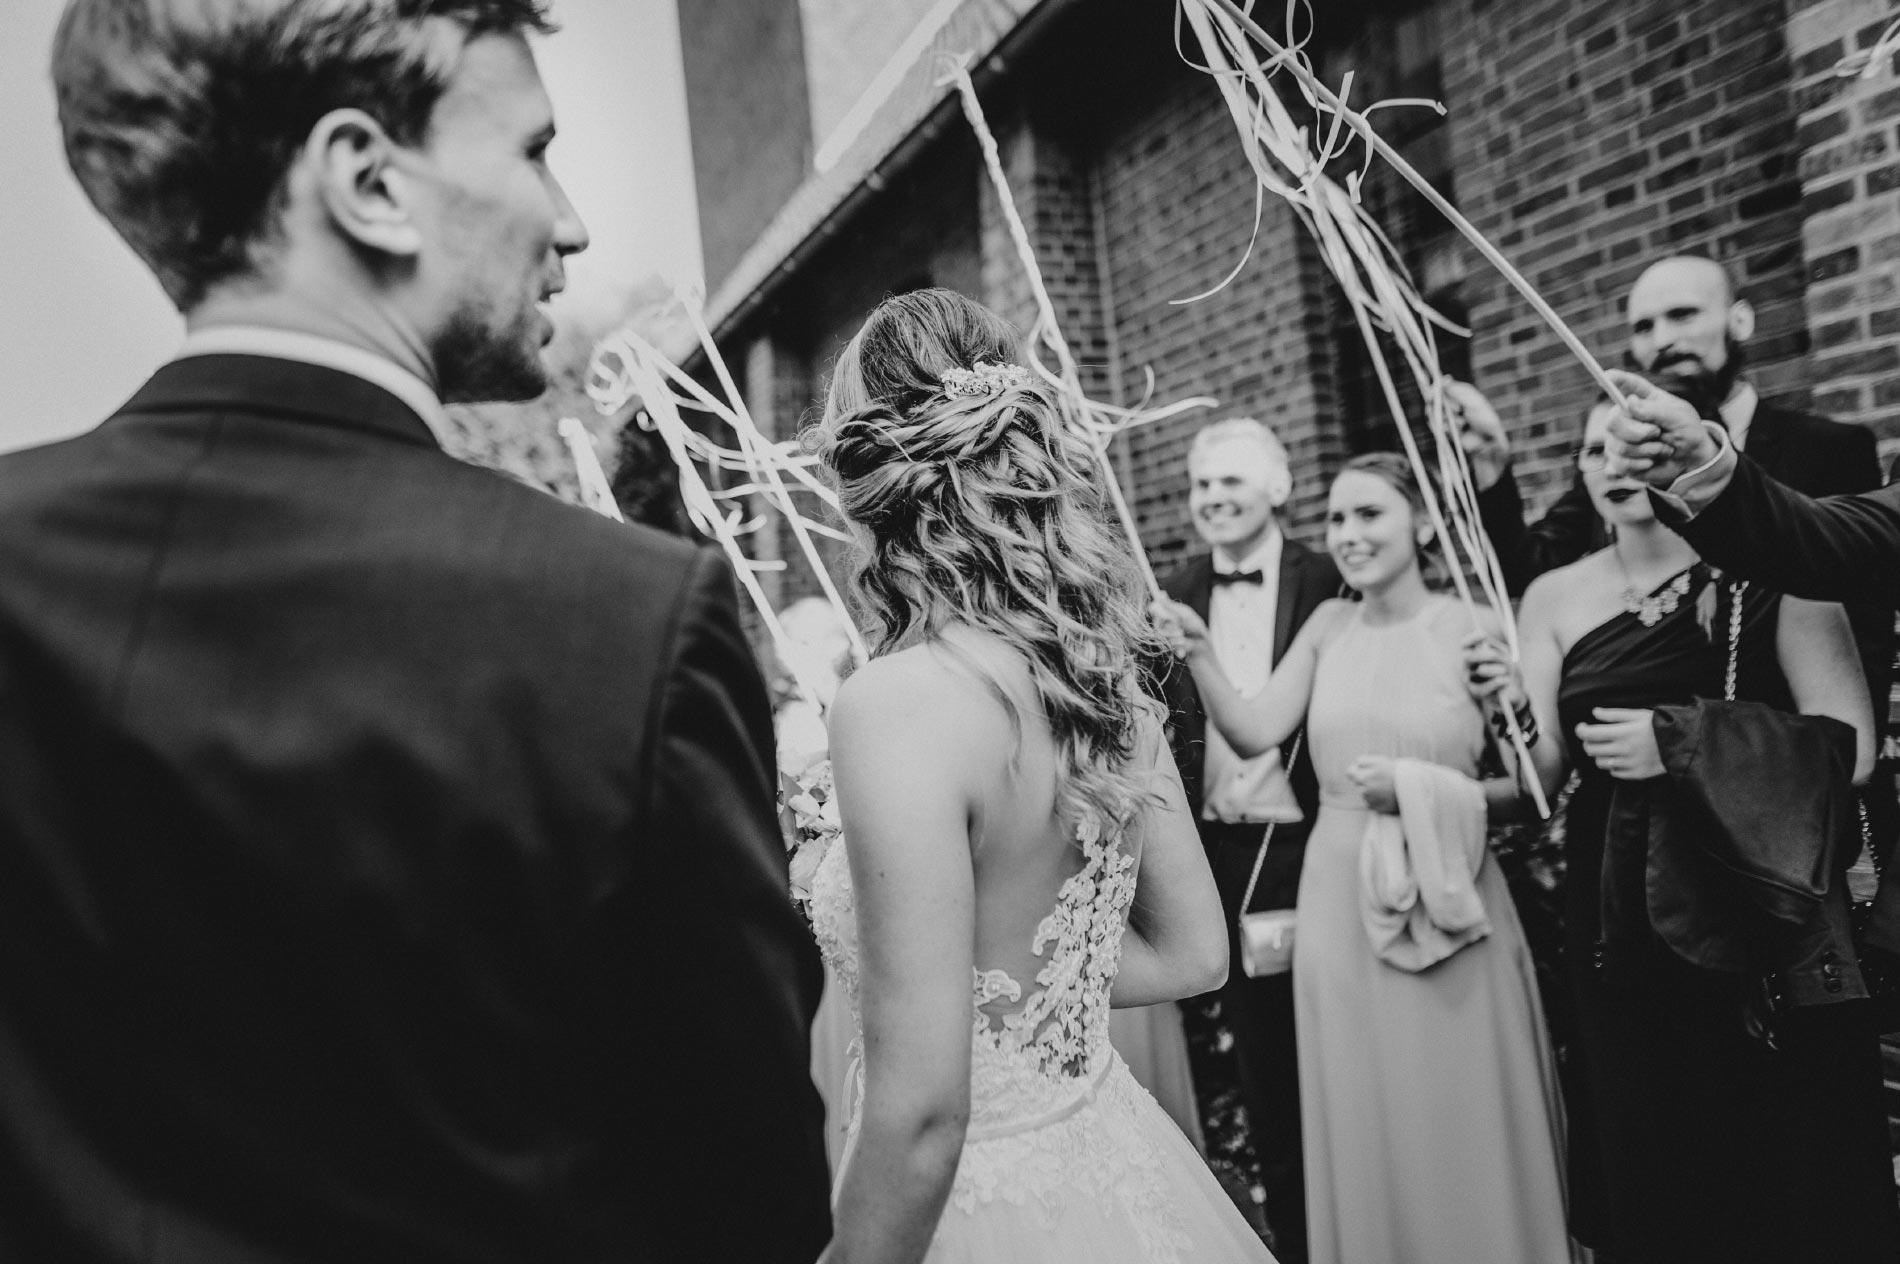 Hochzeitsfotograf Dülmen Michael Kapelle hochzeit